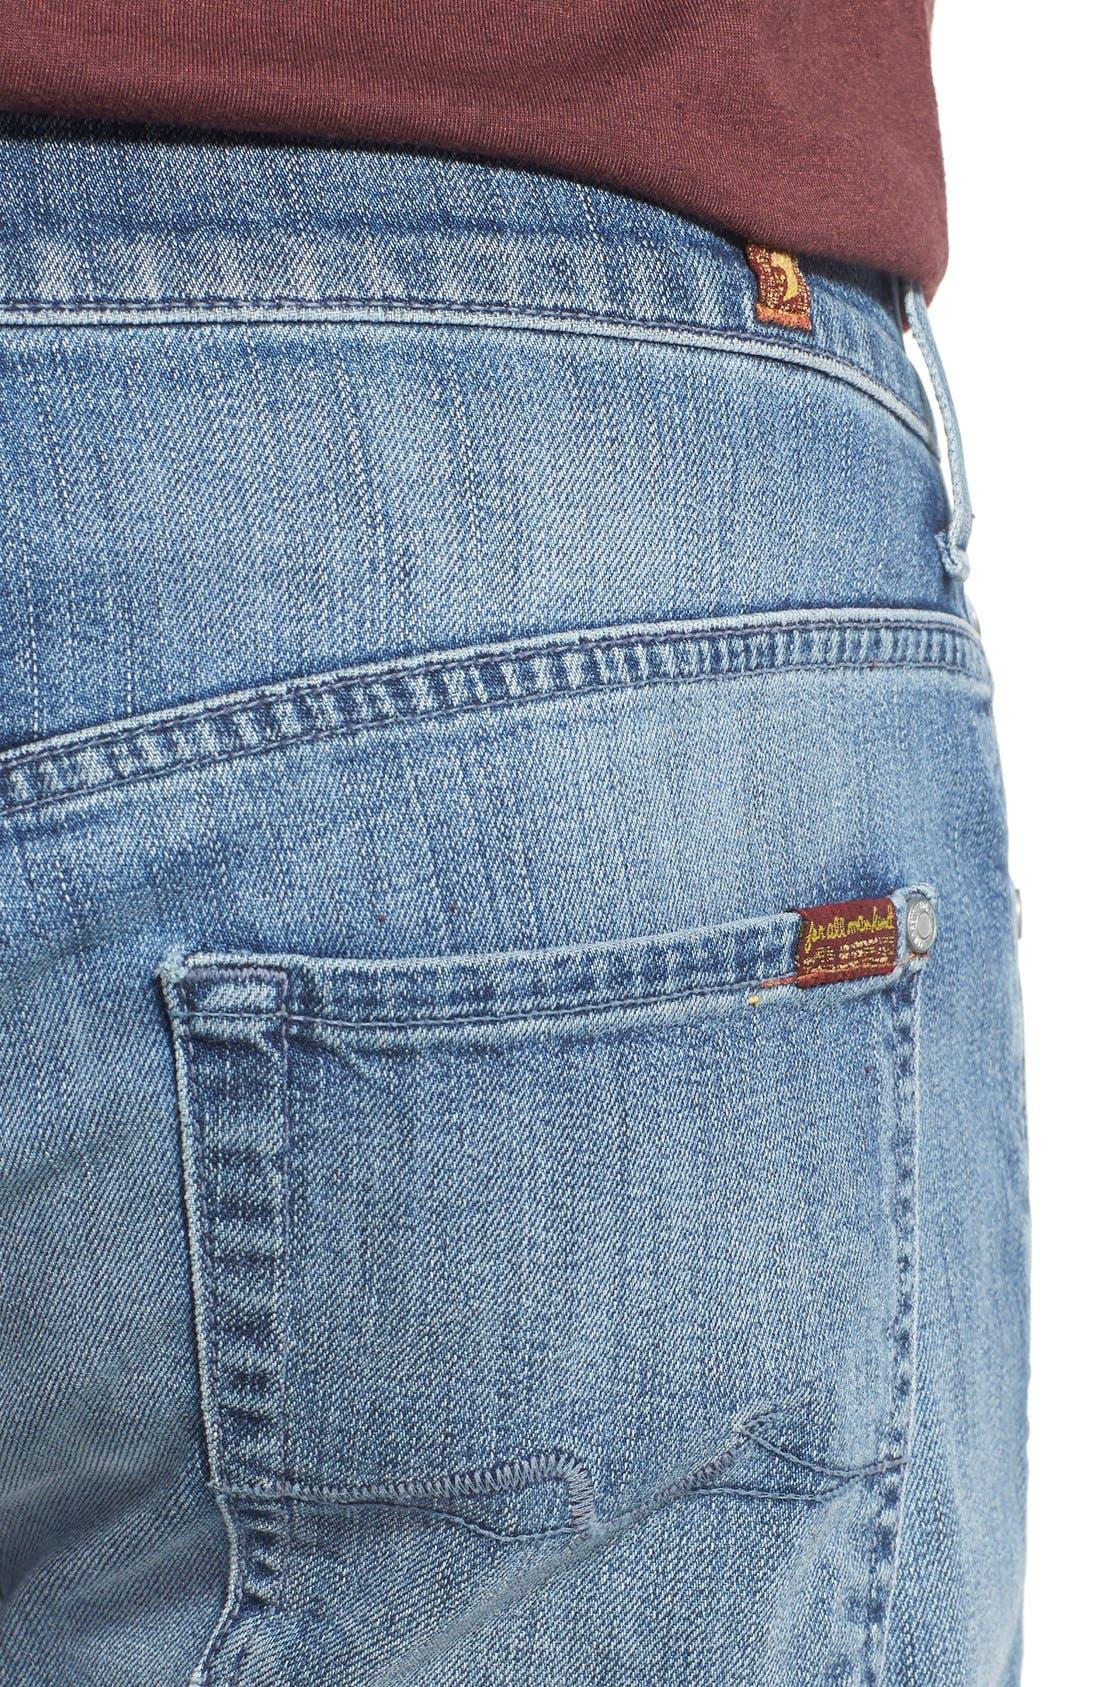 'Straight - FoolProof' Slim Straight Leg Jeans,                             Alternate thumbnail 4, color,                             Tribute